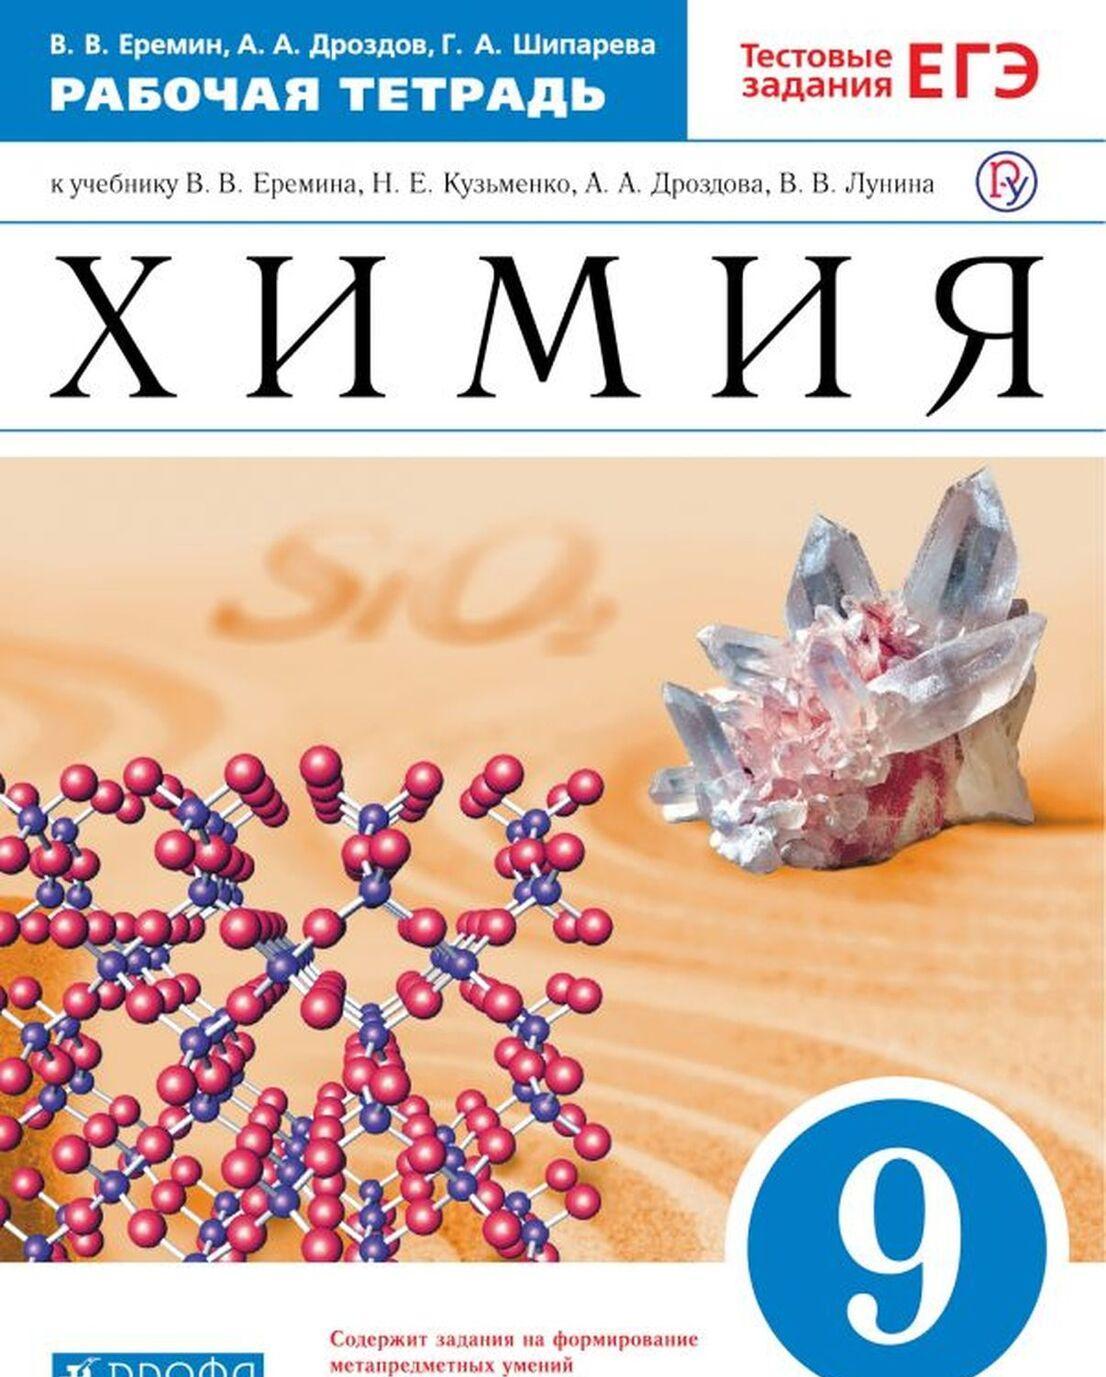 Khimija. 9 klass. Rabochaja tetrad k uchebniku V. V. Eremina, N. E. Kuzmenko, A. A, Drozdova, V. V. Lunina